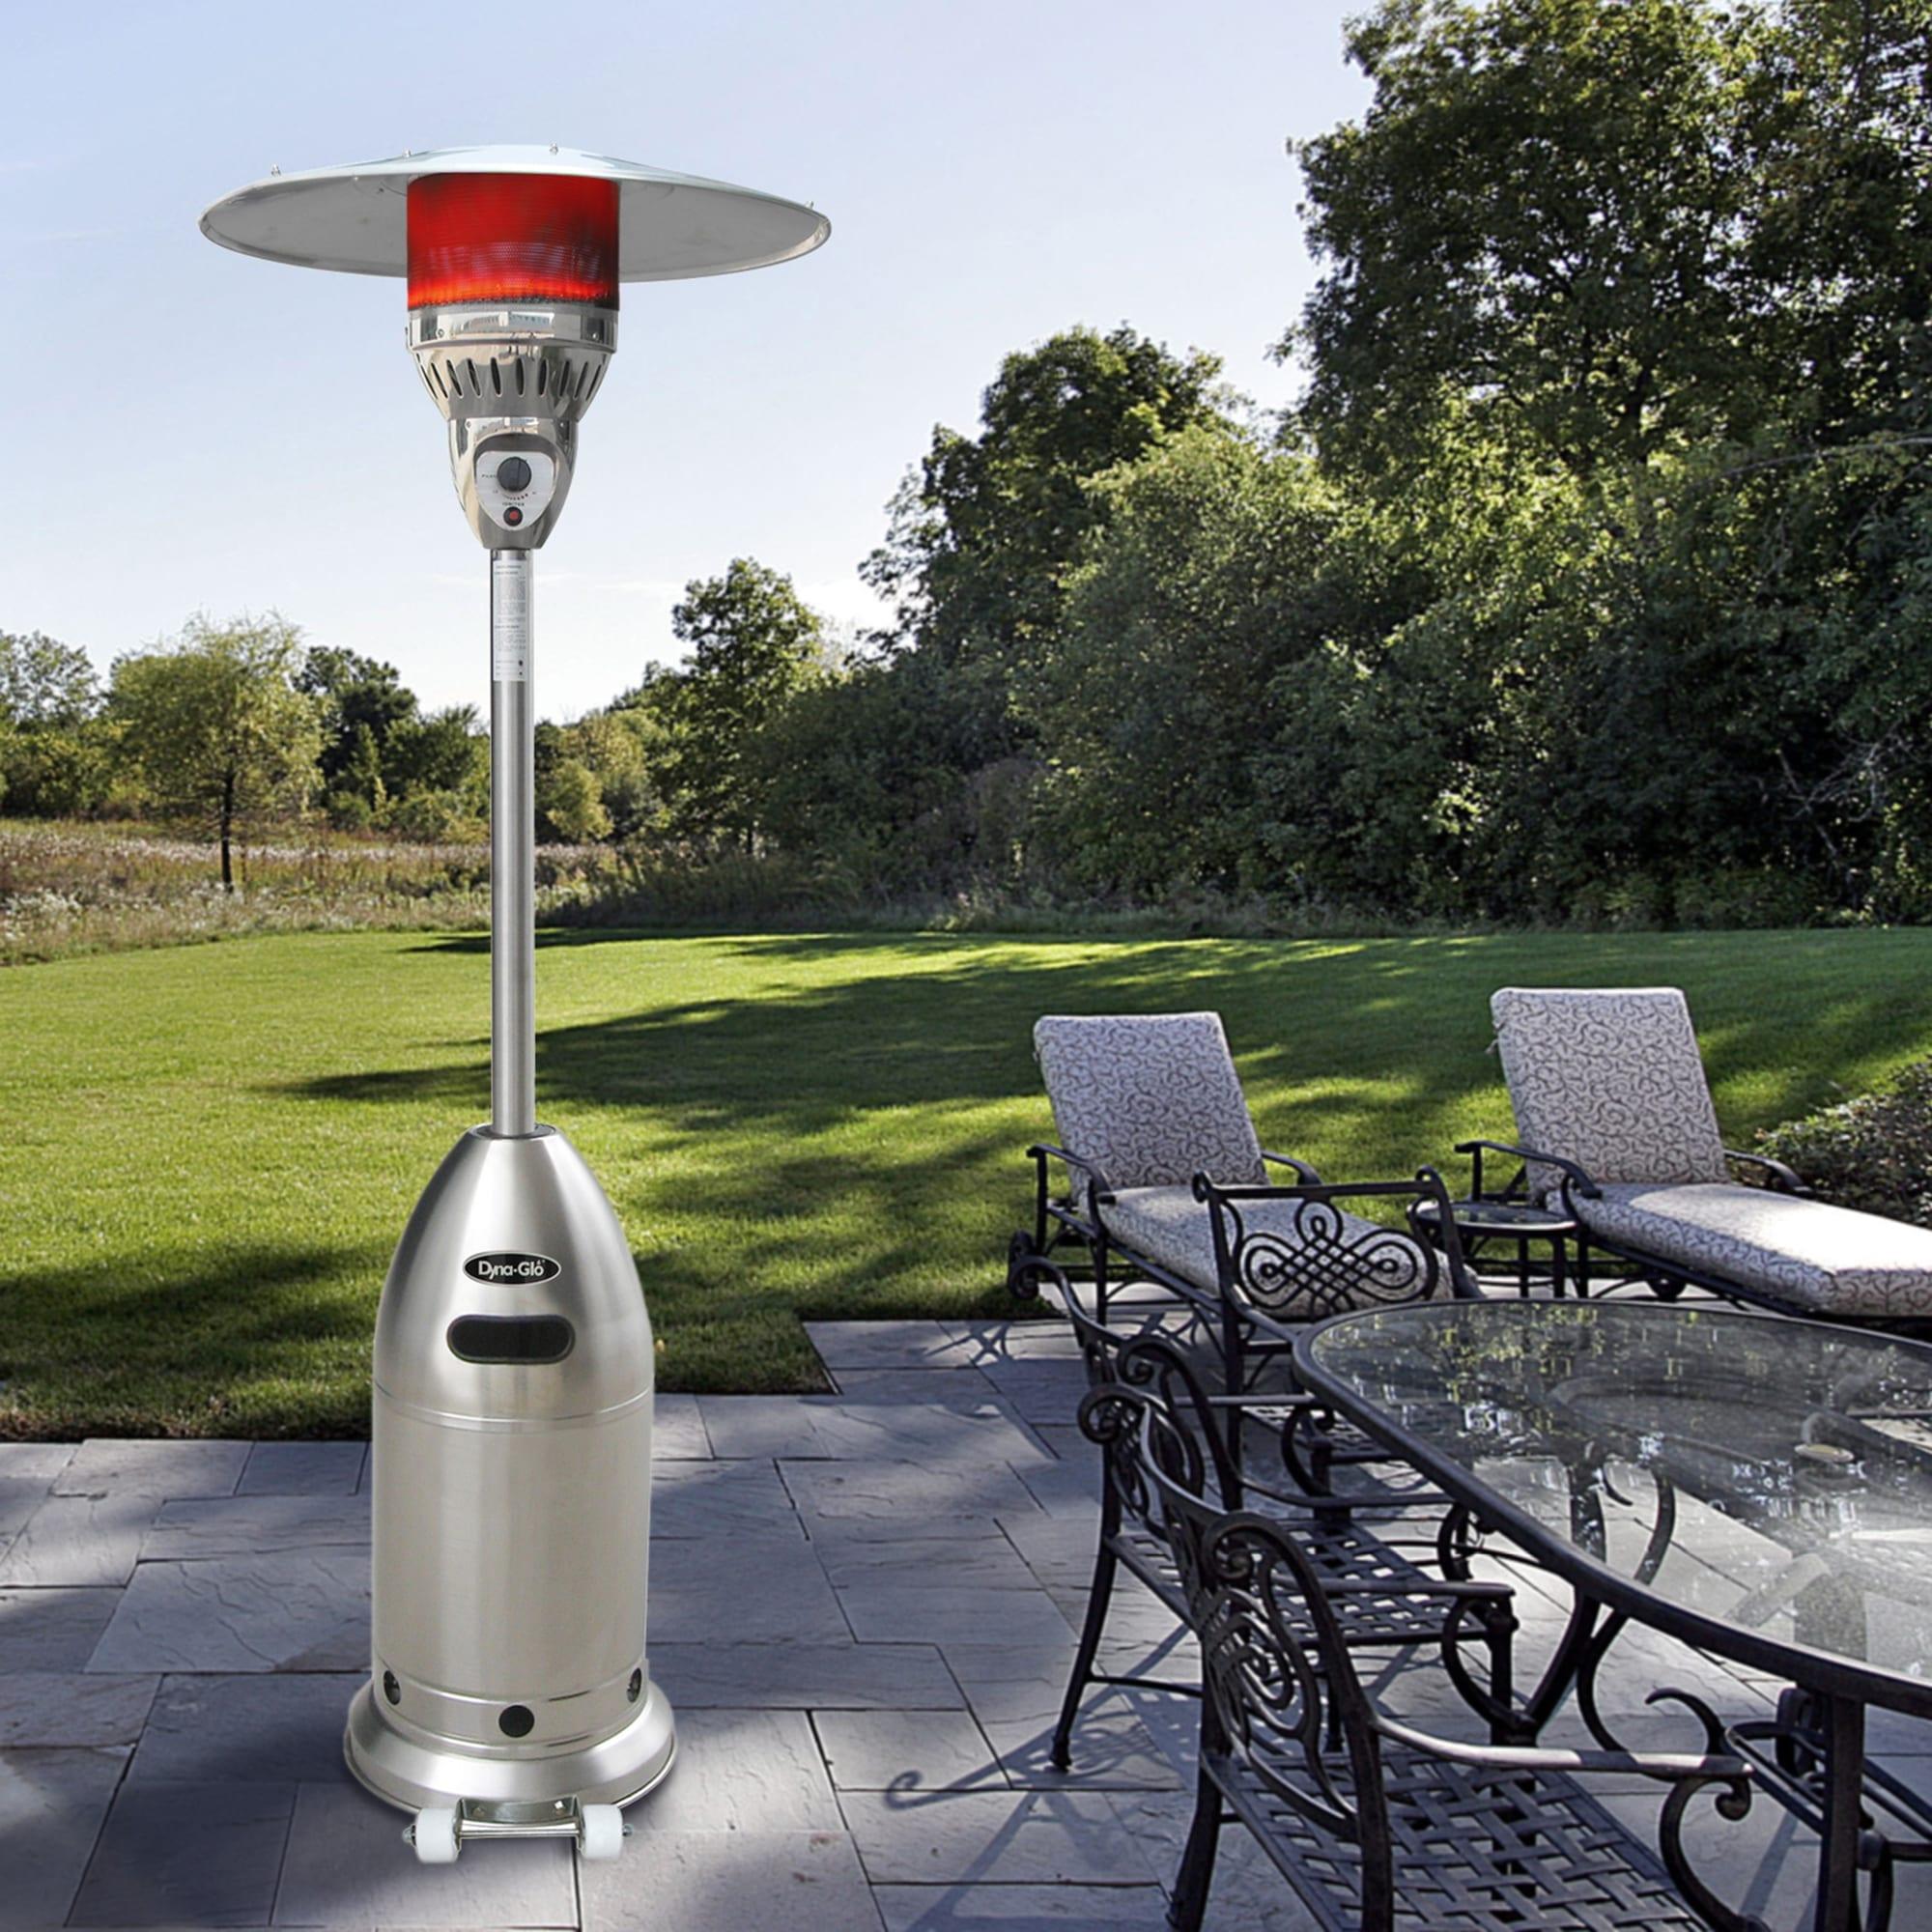 patio heater repair grill tanks plus